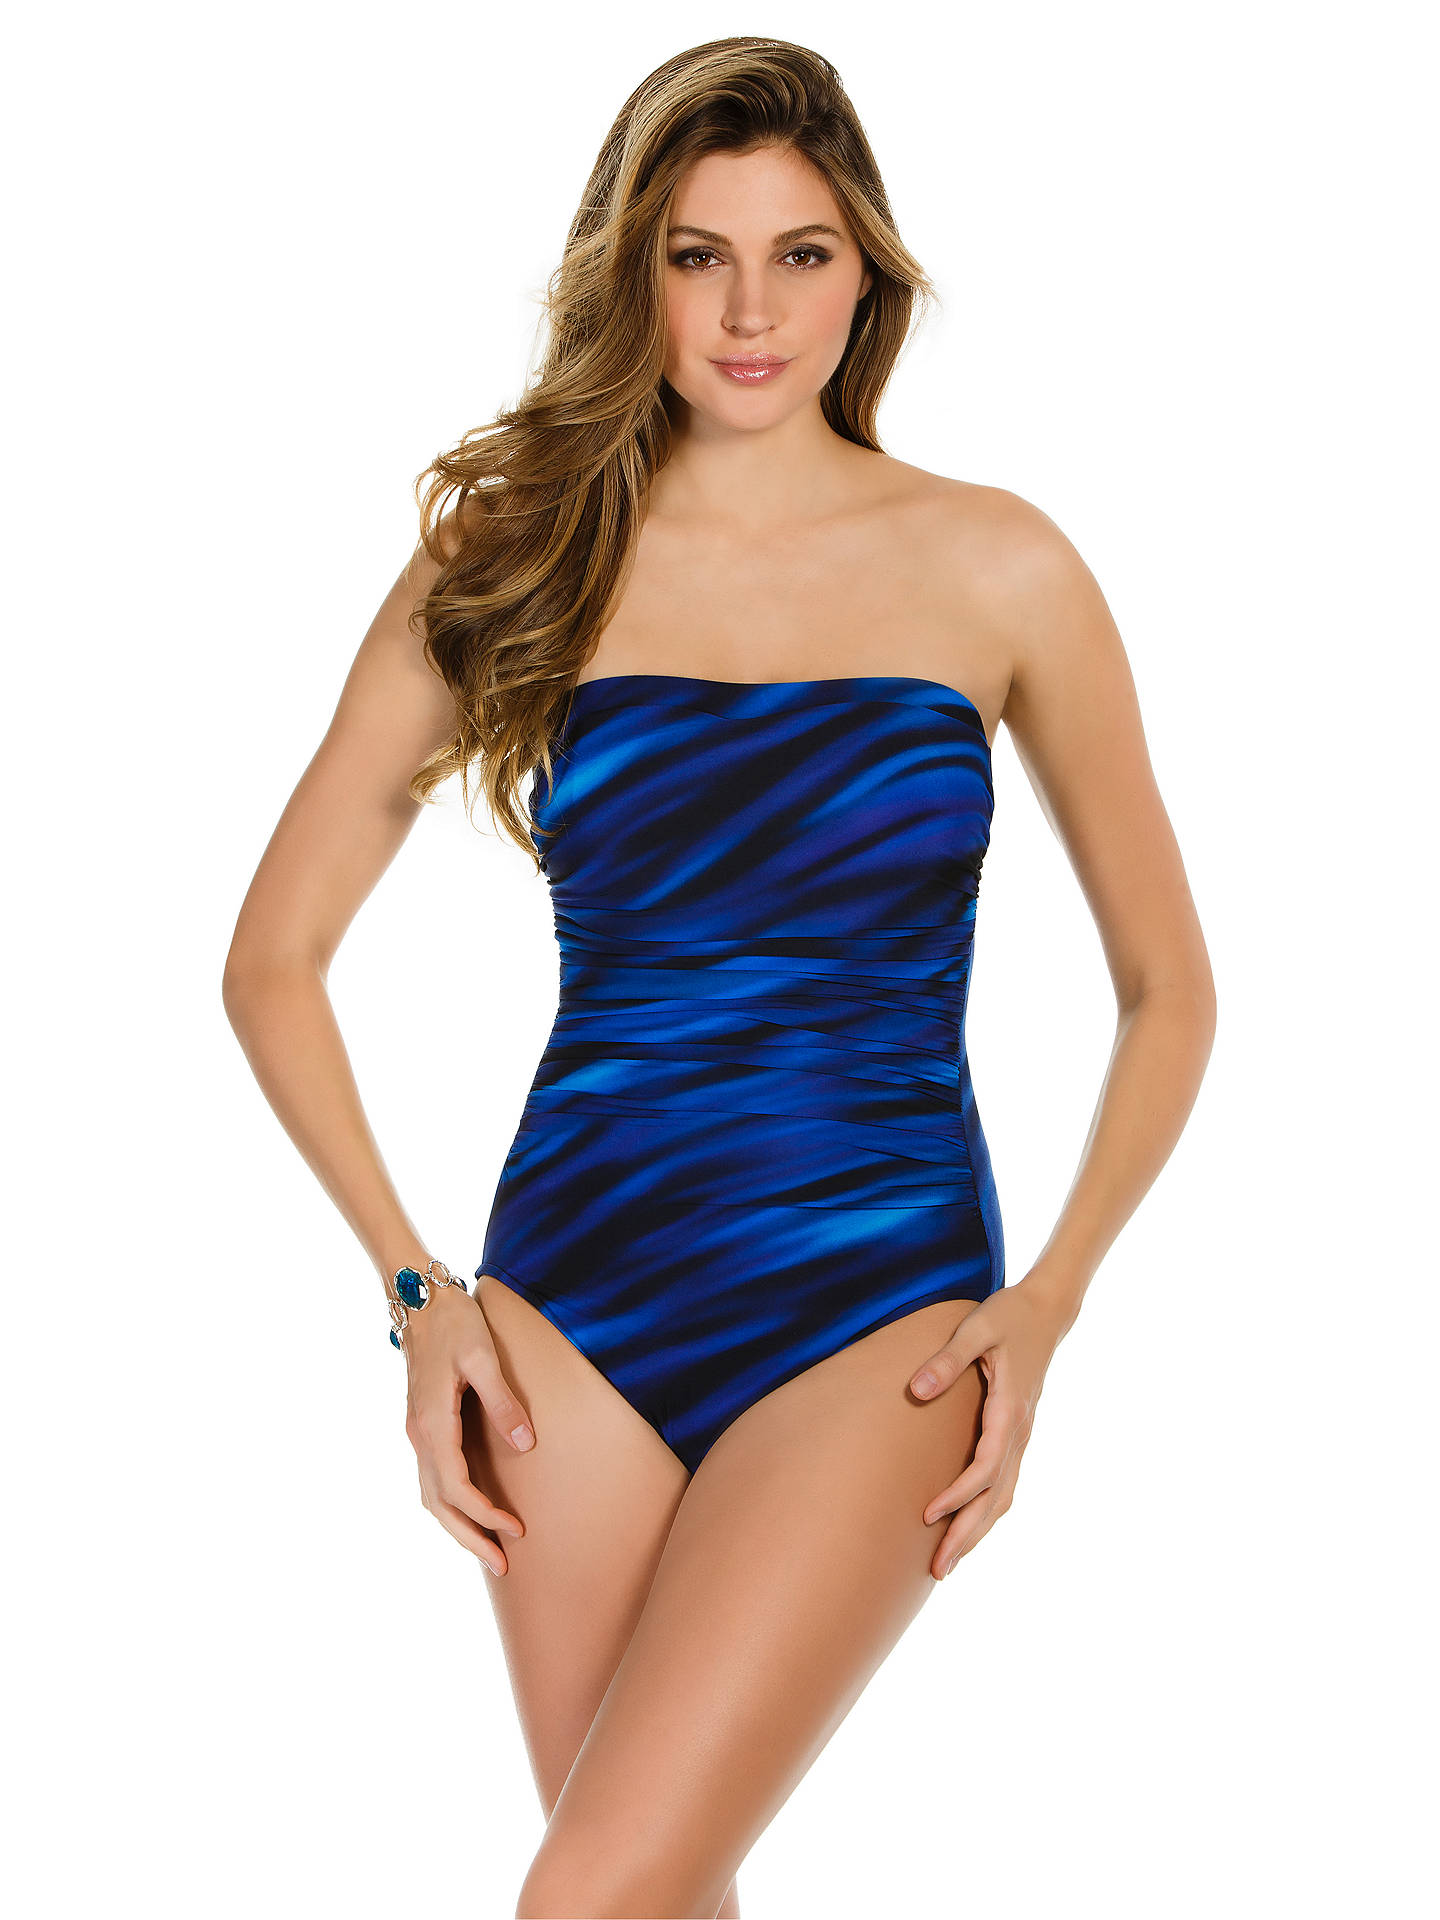 b6e3147bbf BuyMiraclesuit Avanti Wavy Bandeau Control Swimsuit